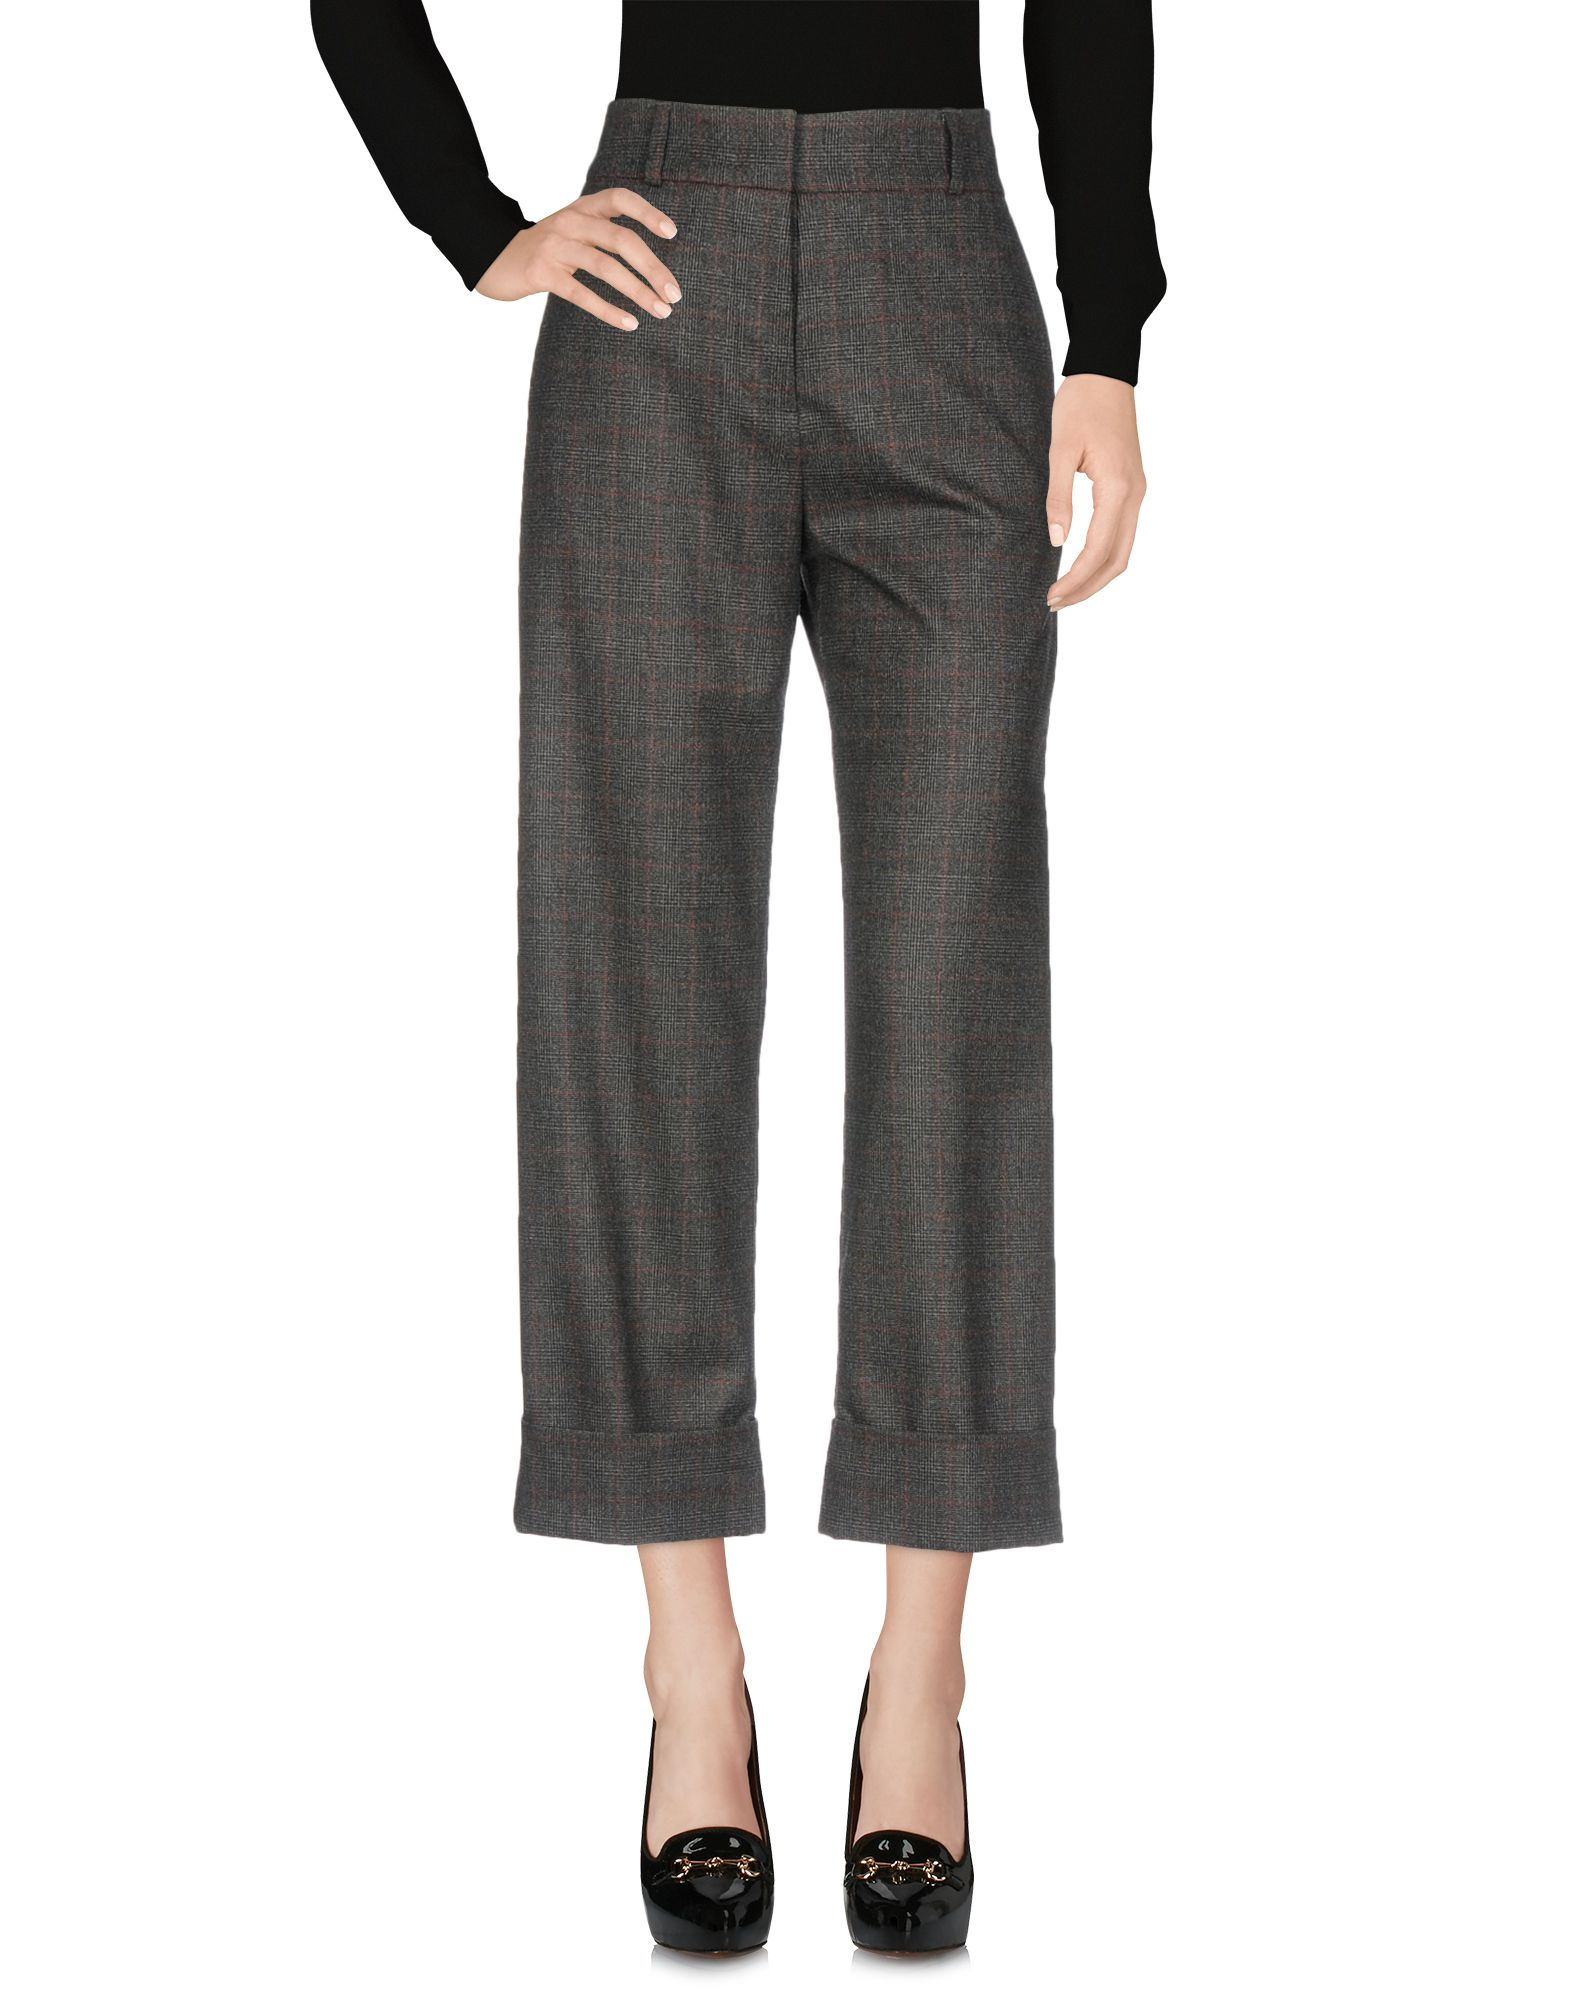 Pantalone Ql2 Quelledue Donna - Acquista online su 3SlgJbQ